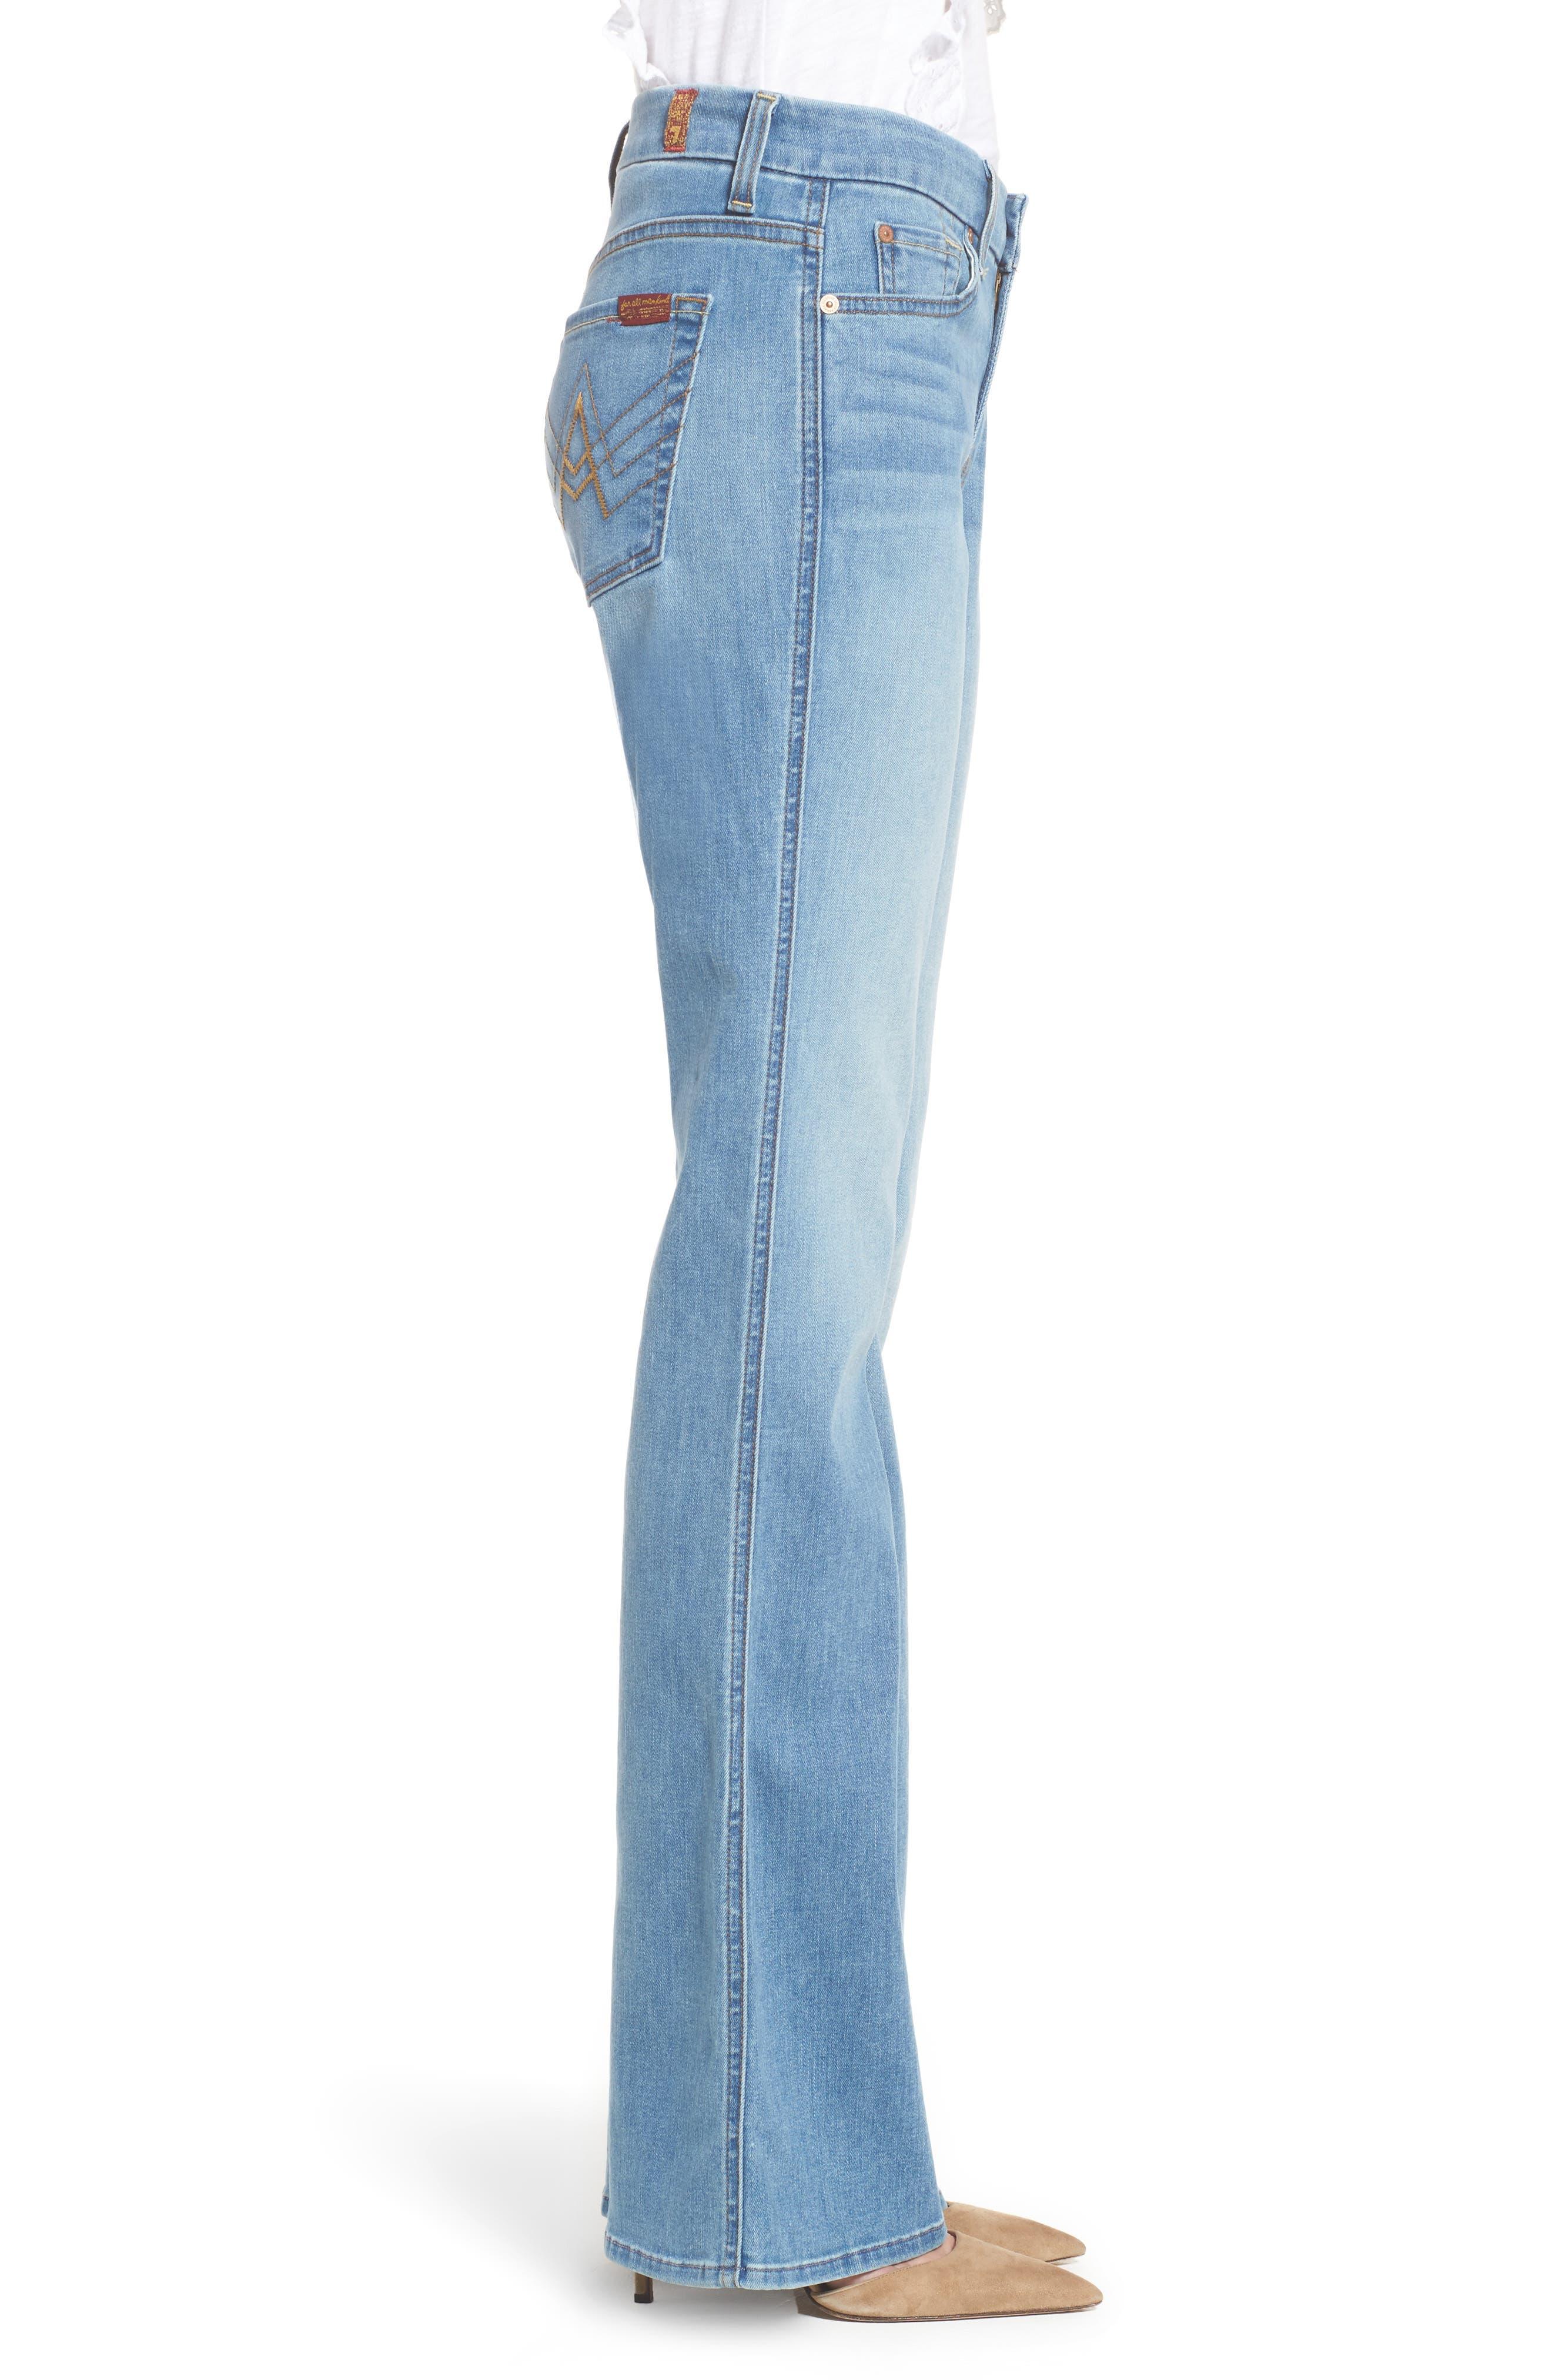 A-Pocket Flare Leg Jeans,                             Alternate thumbnail 3, color,                             401